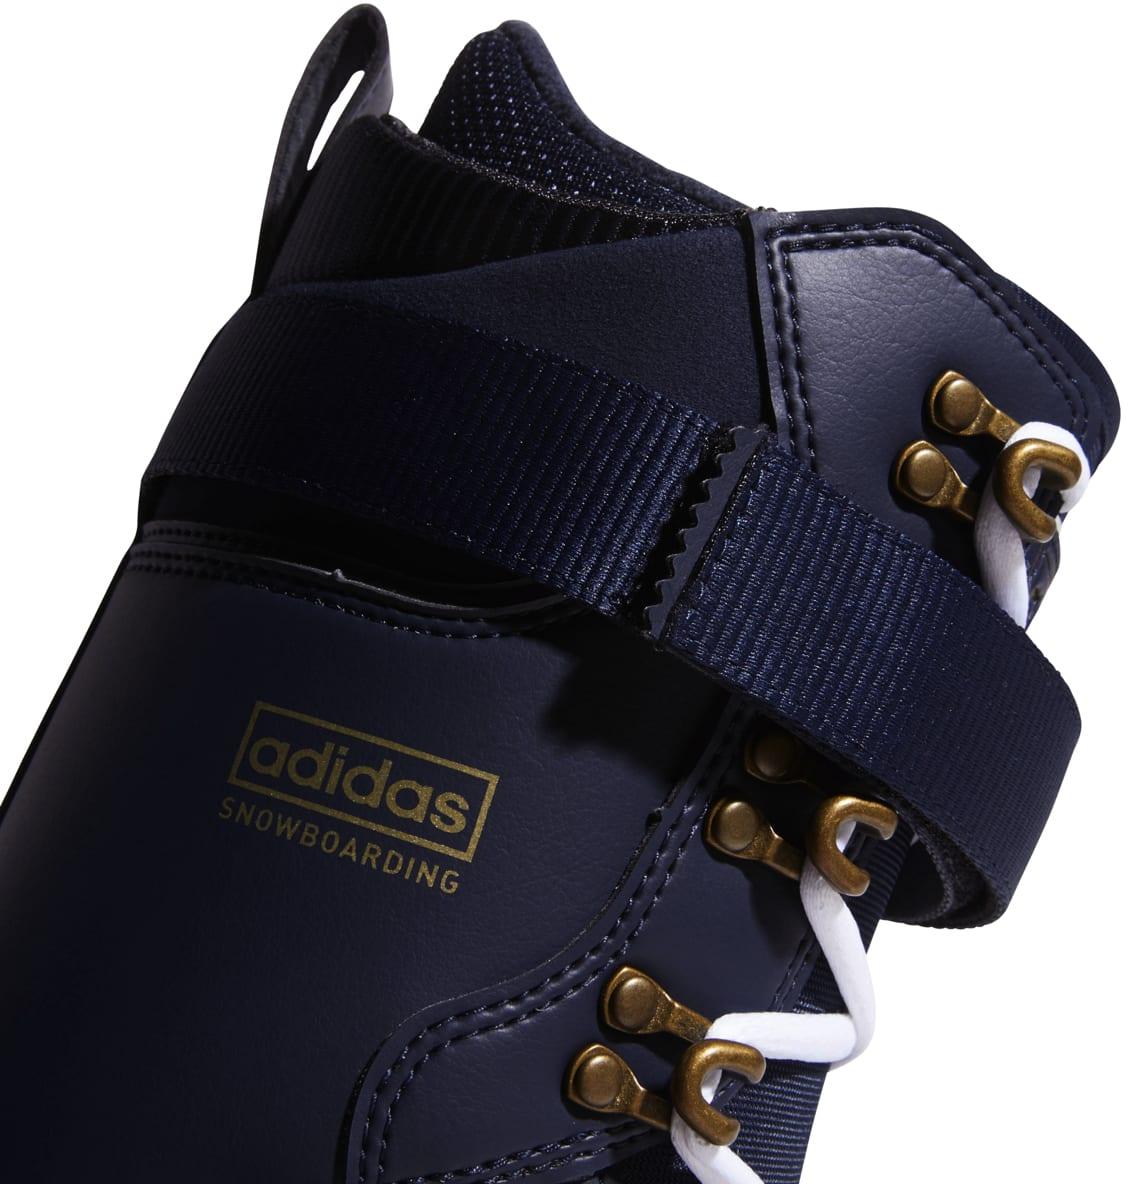 73871bf26a8 Adidas Superstar Adv Snowboard Boots - thumbnail 4